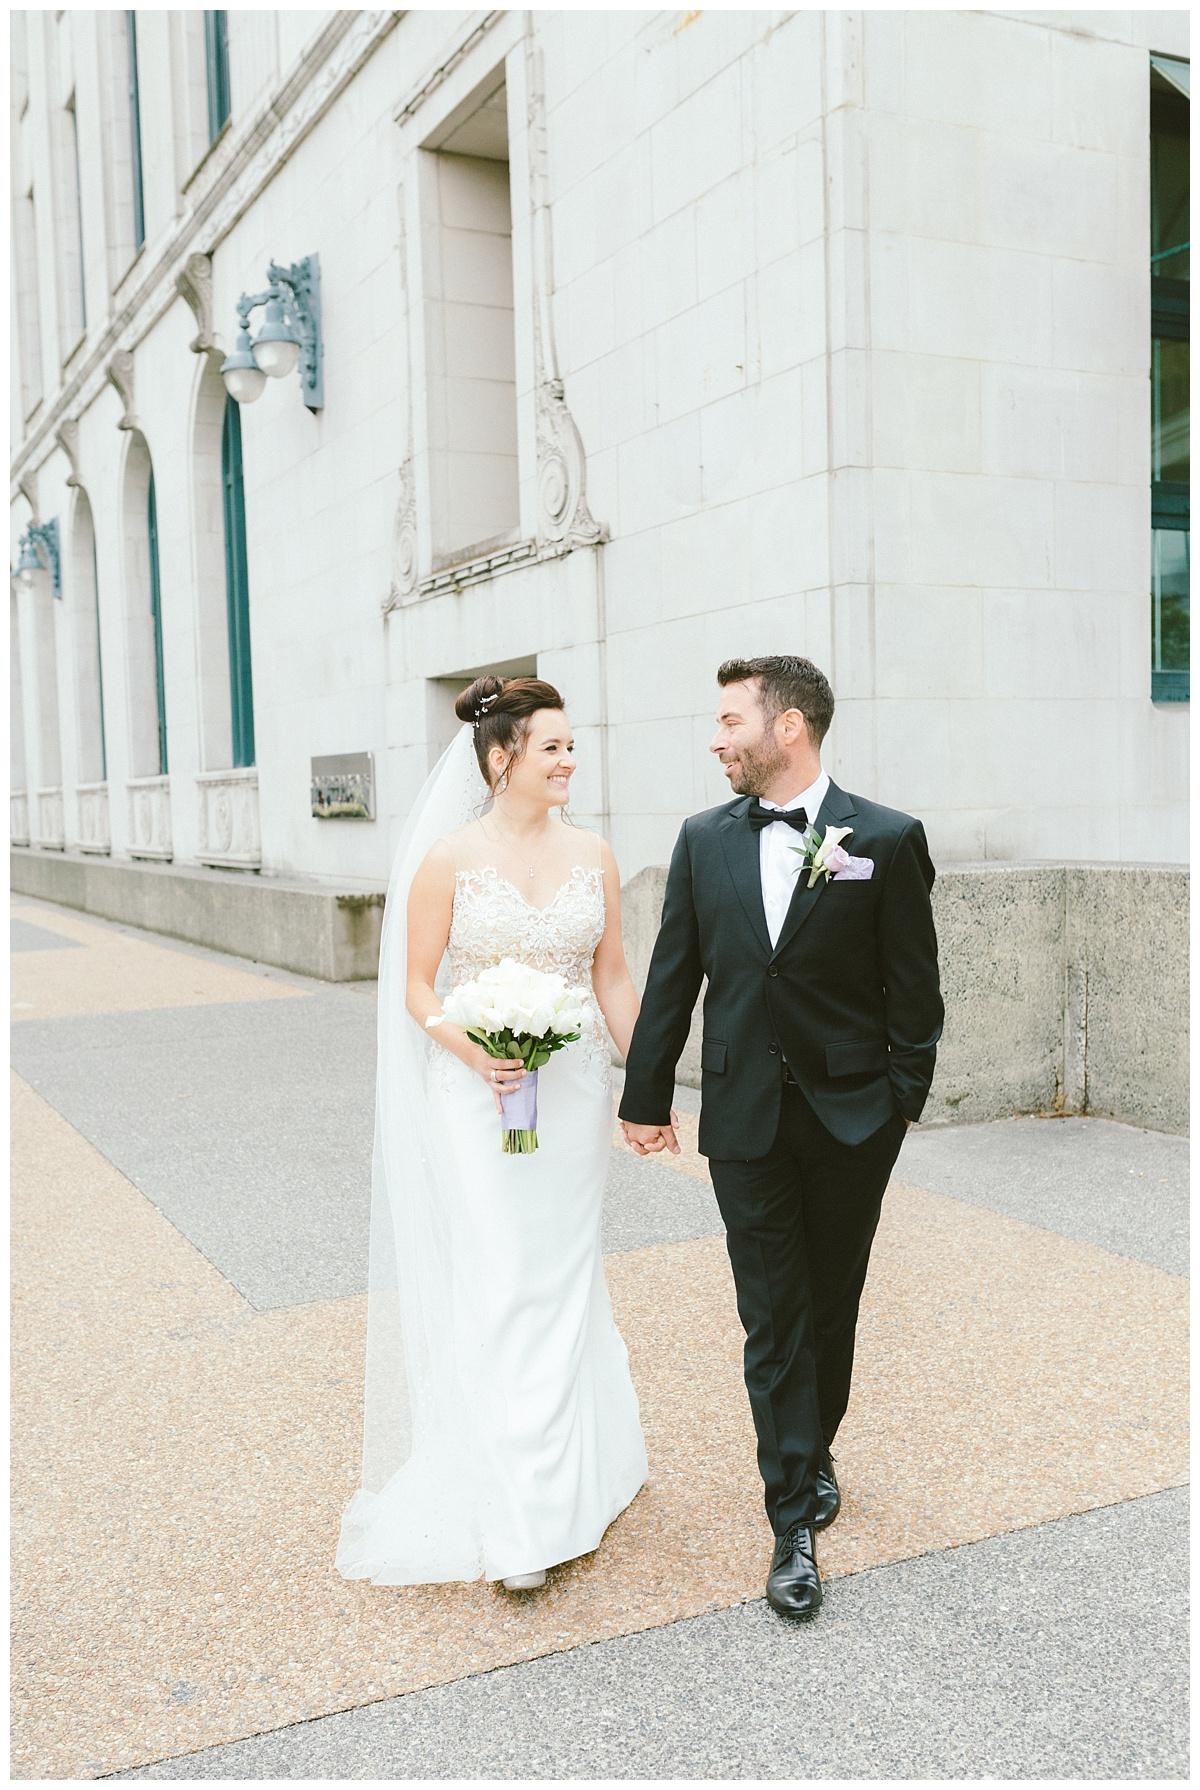 Wedding prewedding photos downtown Vancouver BC (Gastown)